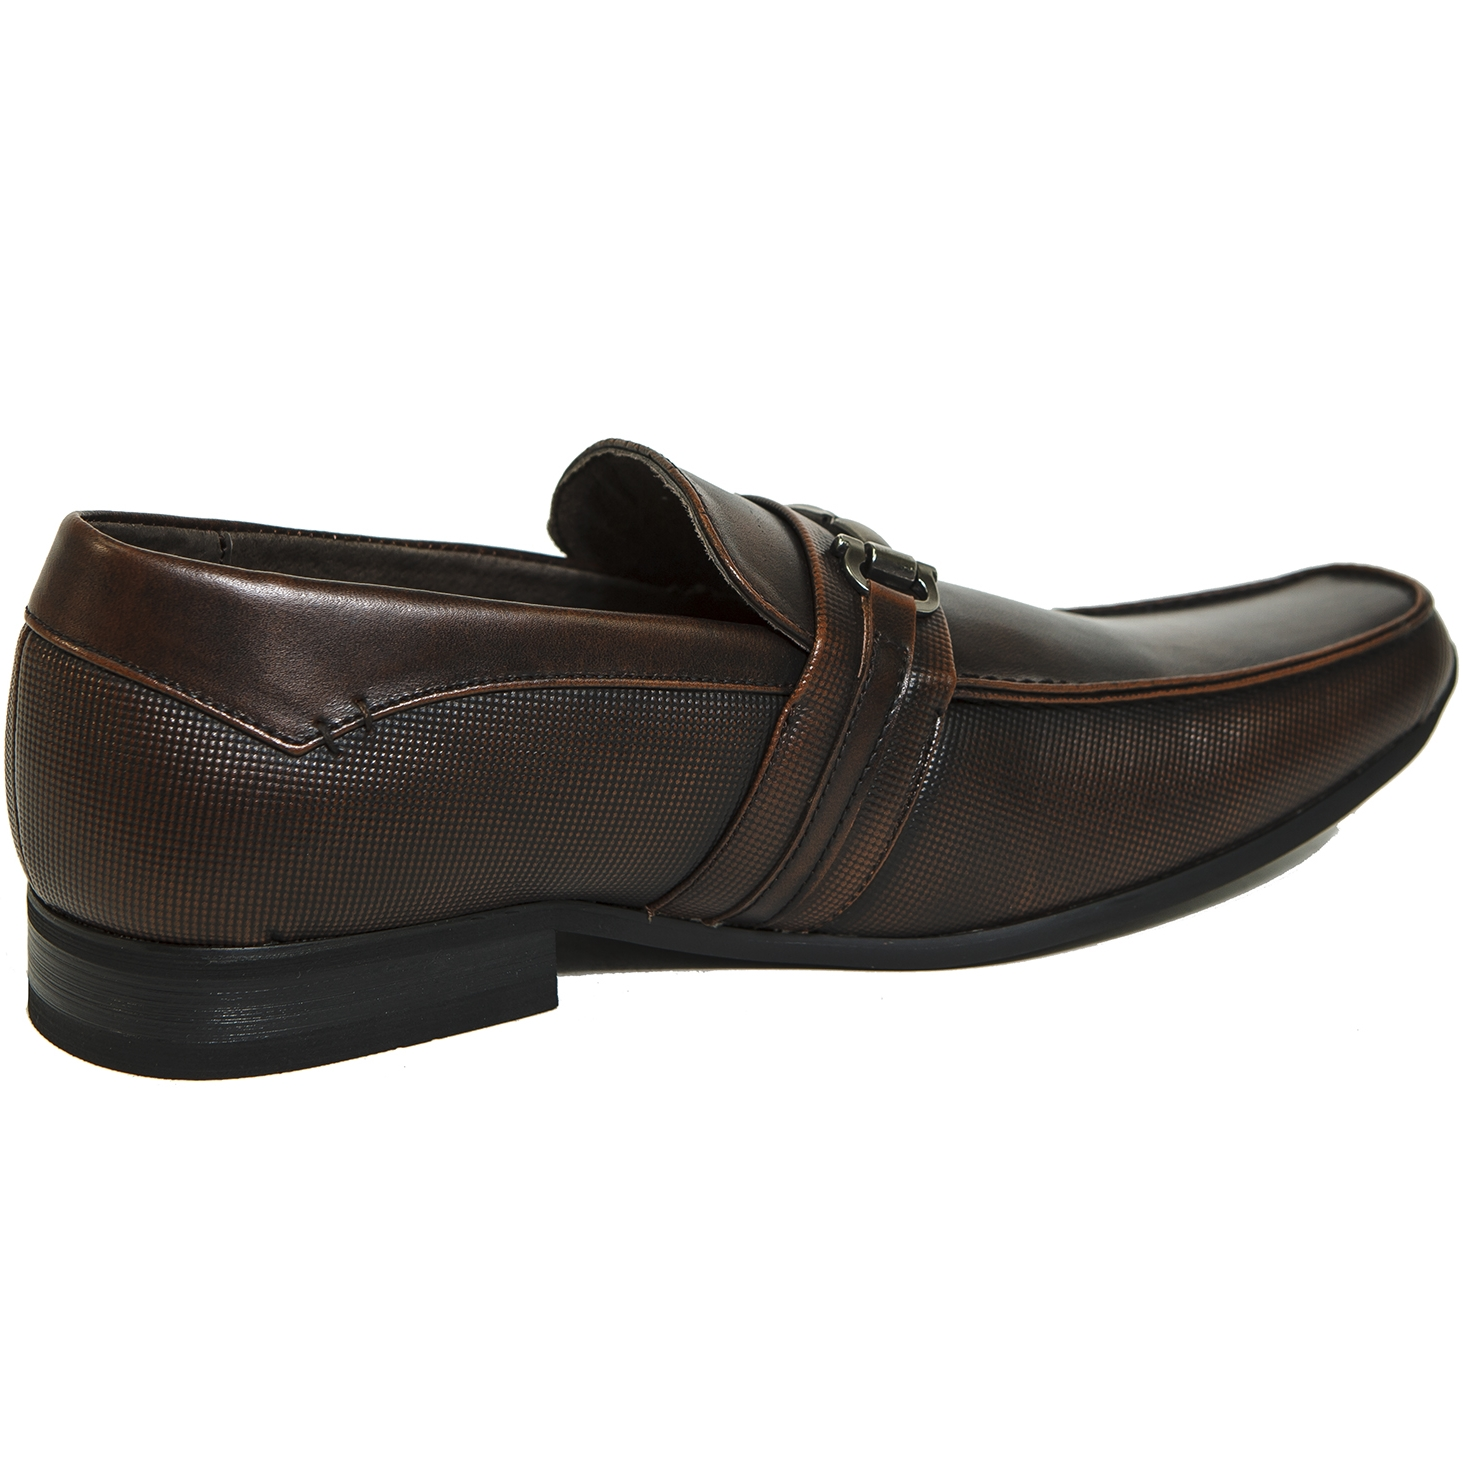 Alpine Swiss Stelvio Mens Buckle Loafers Slip On Tapered Dress Shoes RUNS NARROW